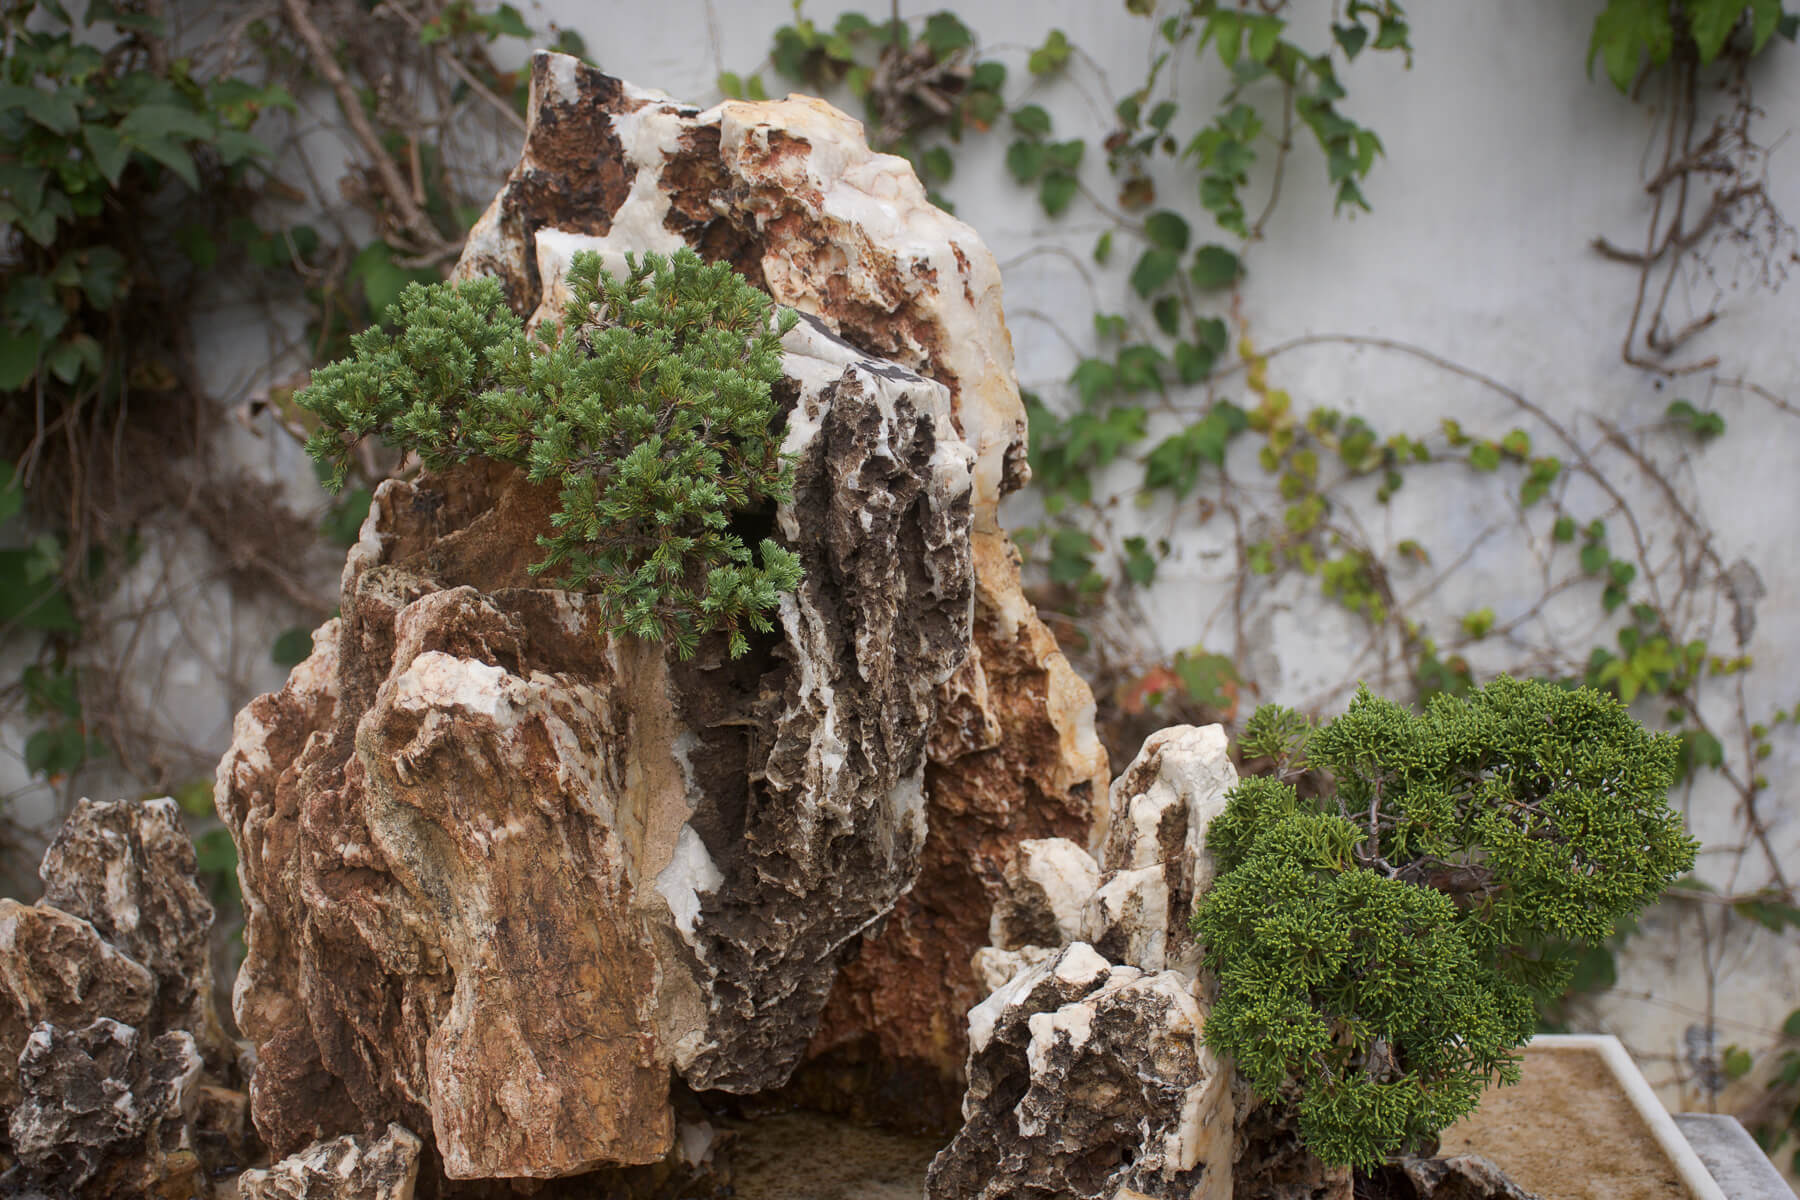 A close up shot of a rocks and Bonsai Tree